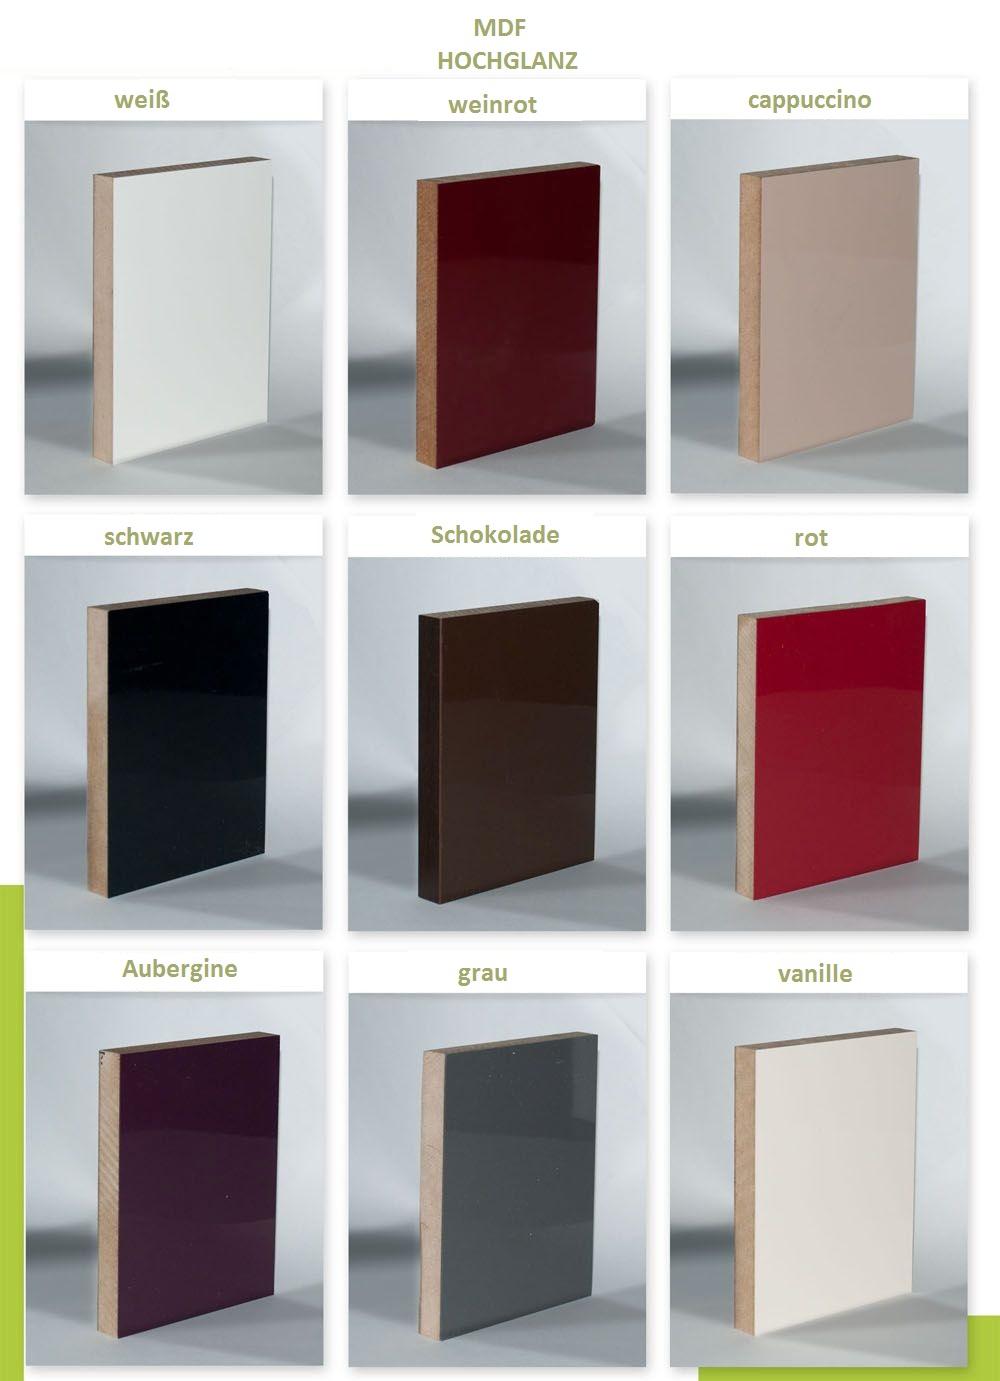 kaufexpert wohnwand cinema cappuccino hochglanz wei mediawand medienwand design modern led. Black Bedroom Furniture Sets. Home Design Ideas